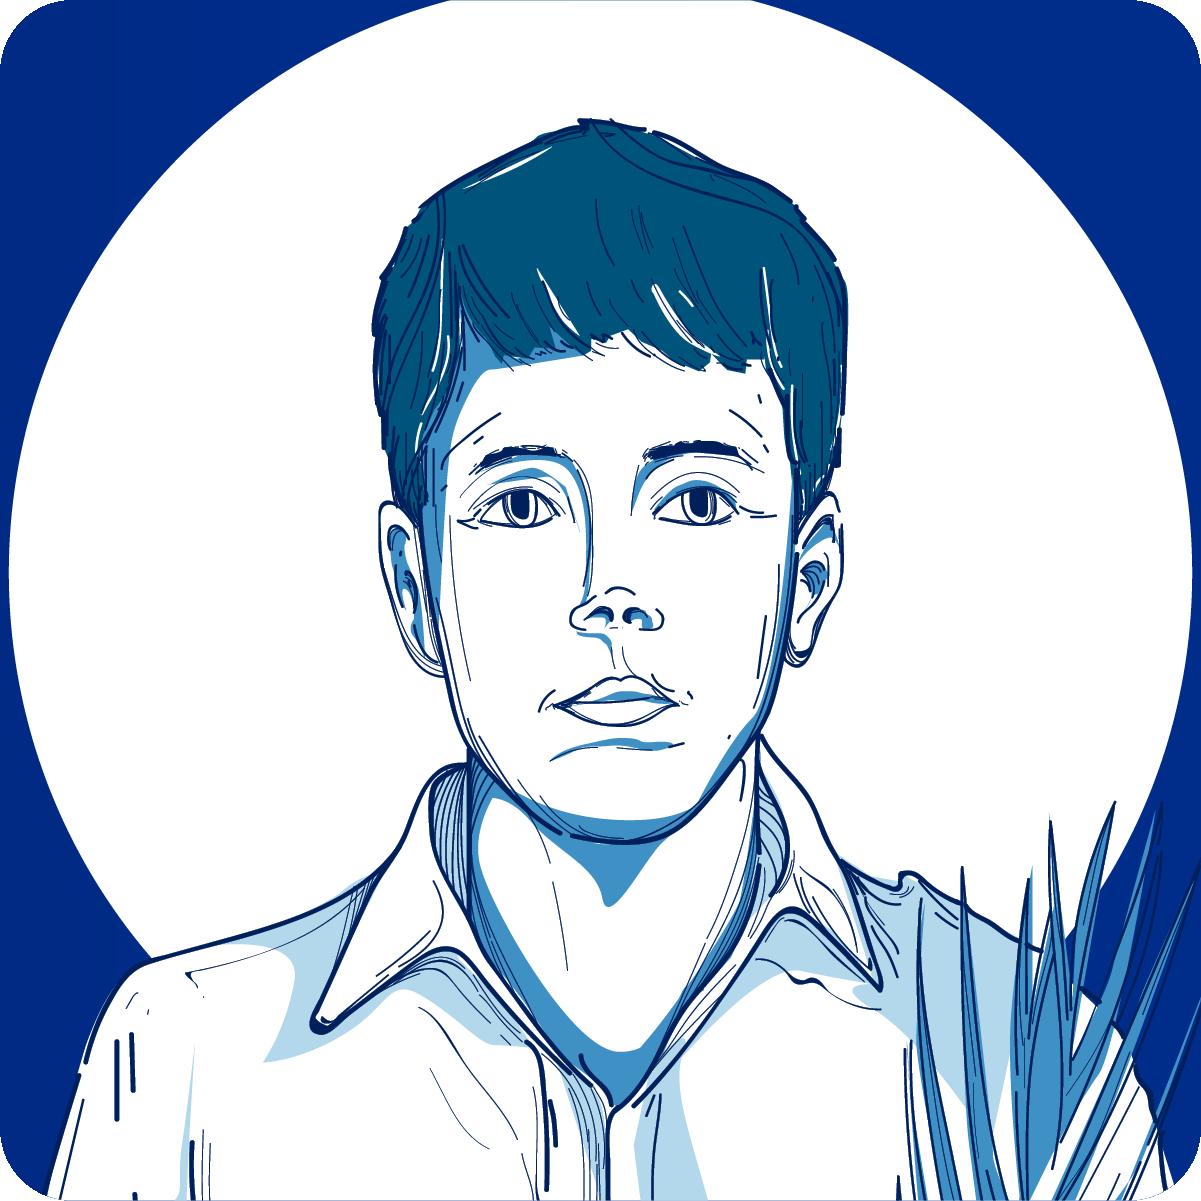 Tarimas_Santos_Artboard 4